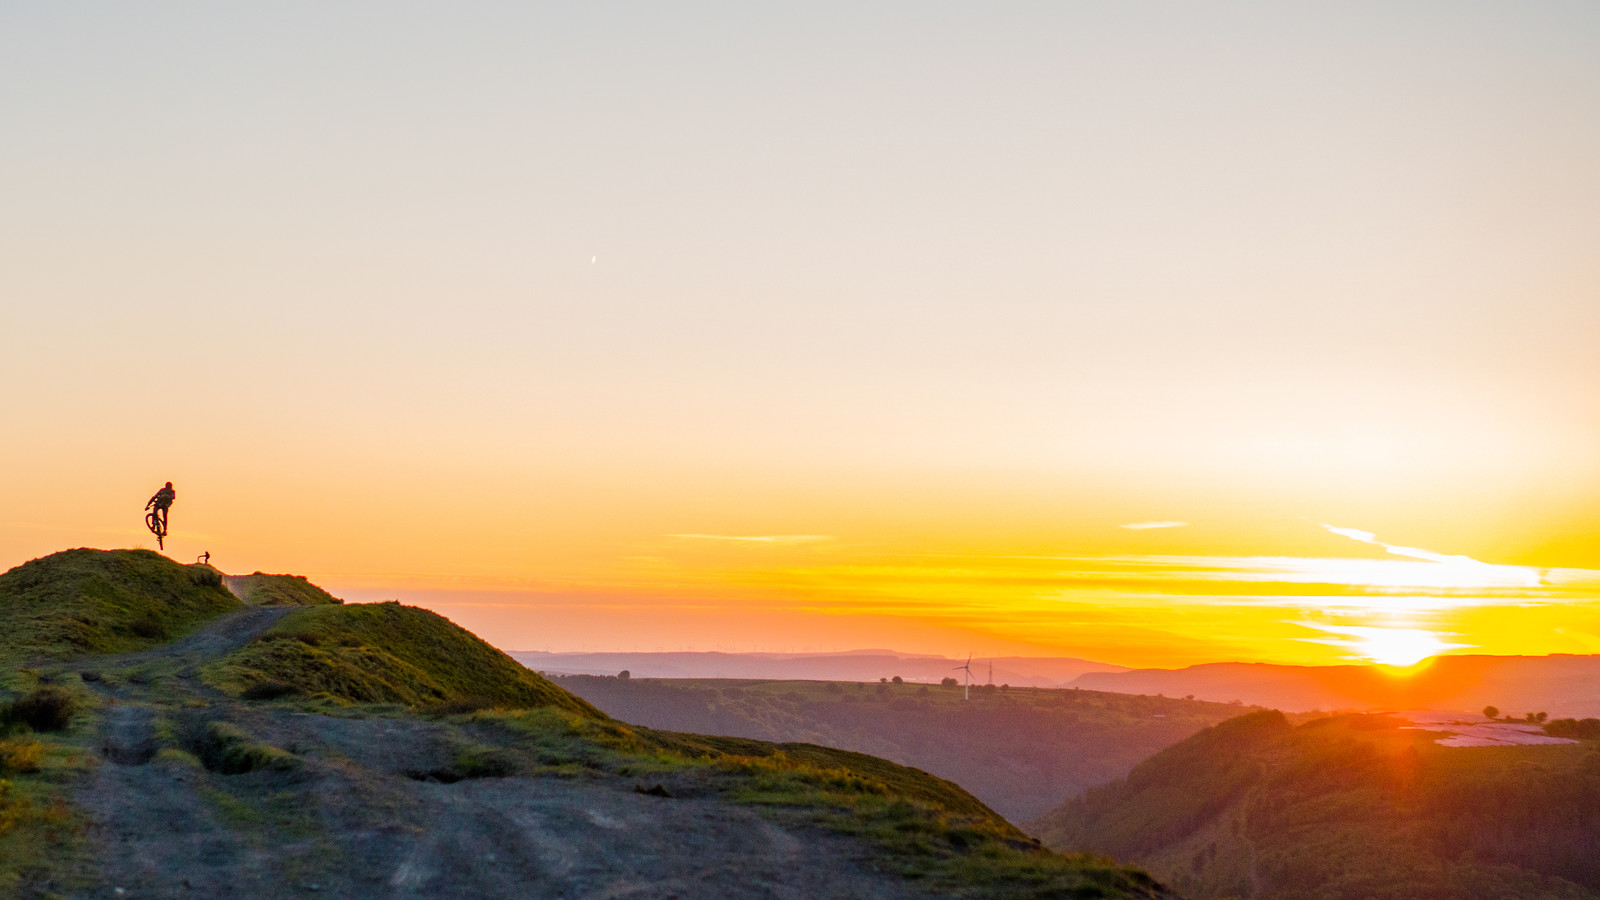 YOOOOO - Matthew Davies - Mountain Biking Pictures - Vital MTB